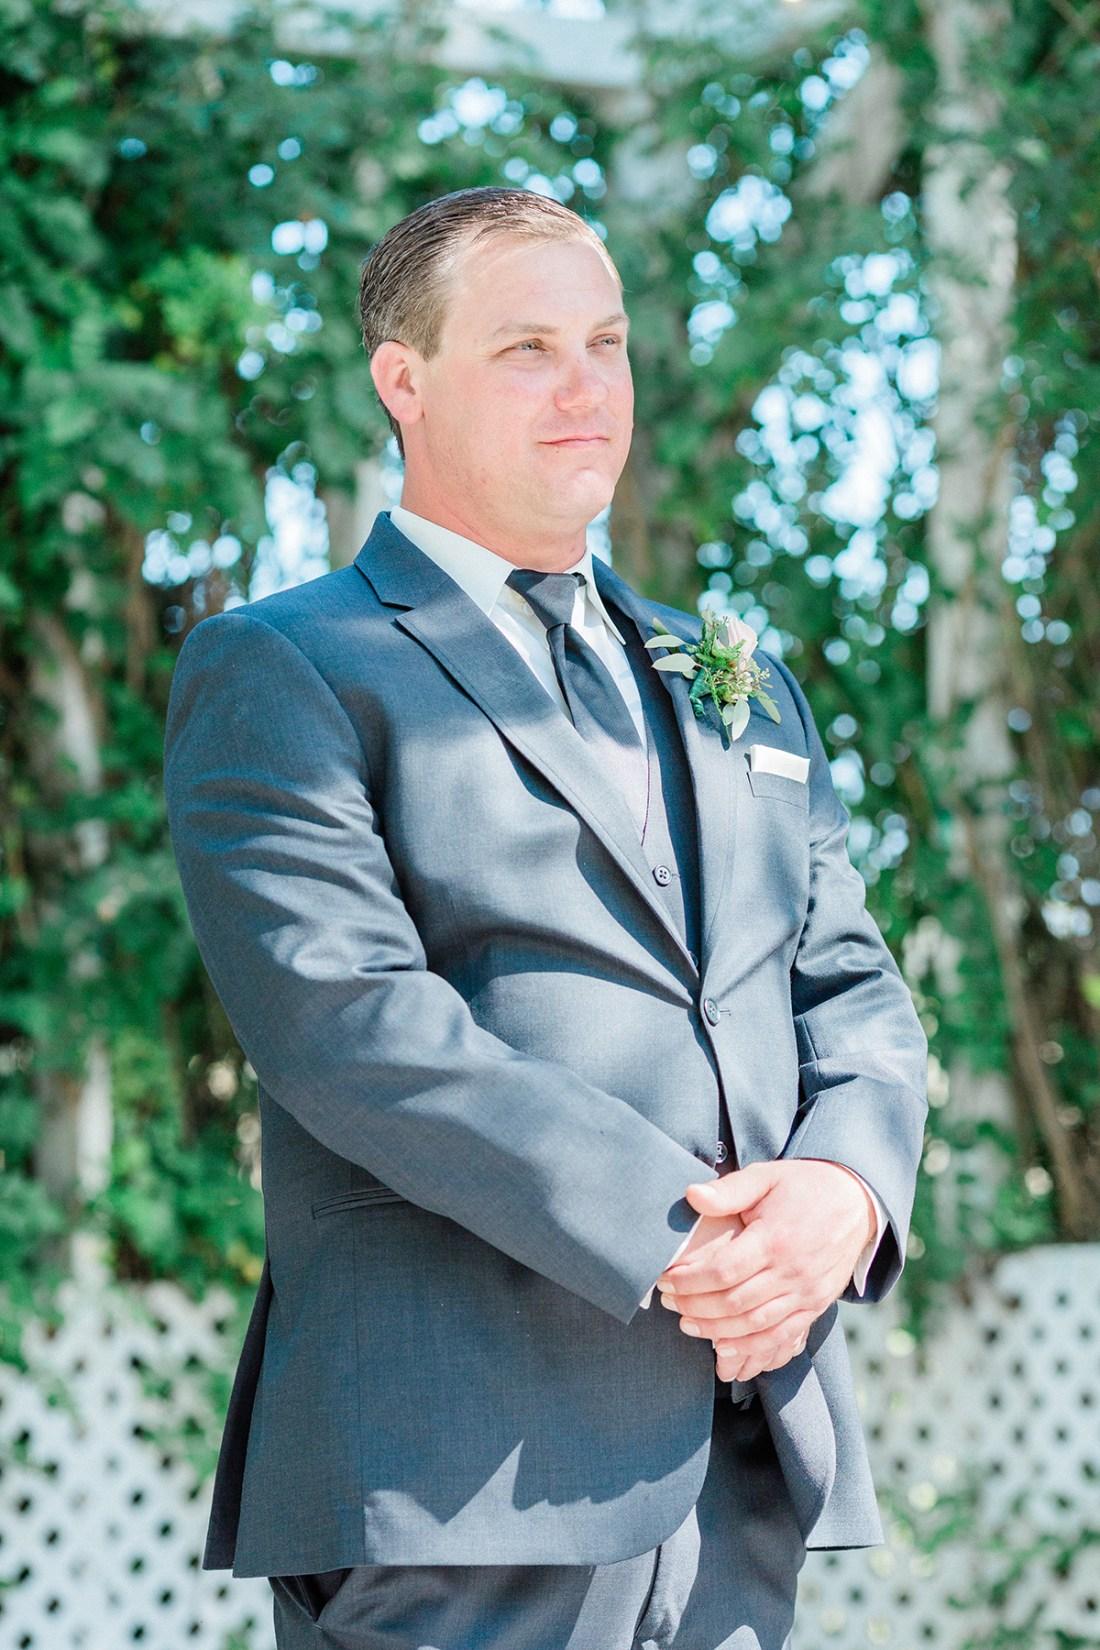 Steve Waiting for His Bride   A Good Hue